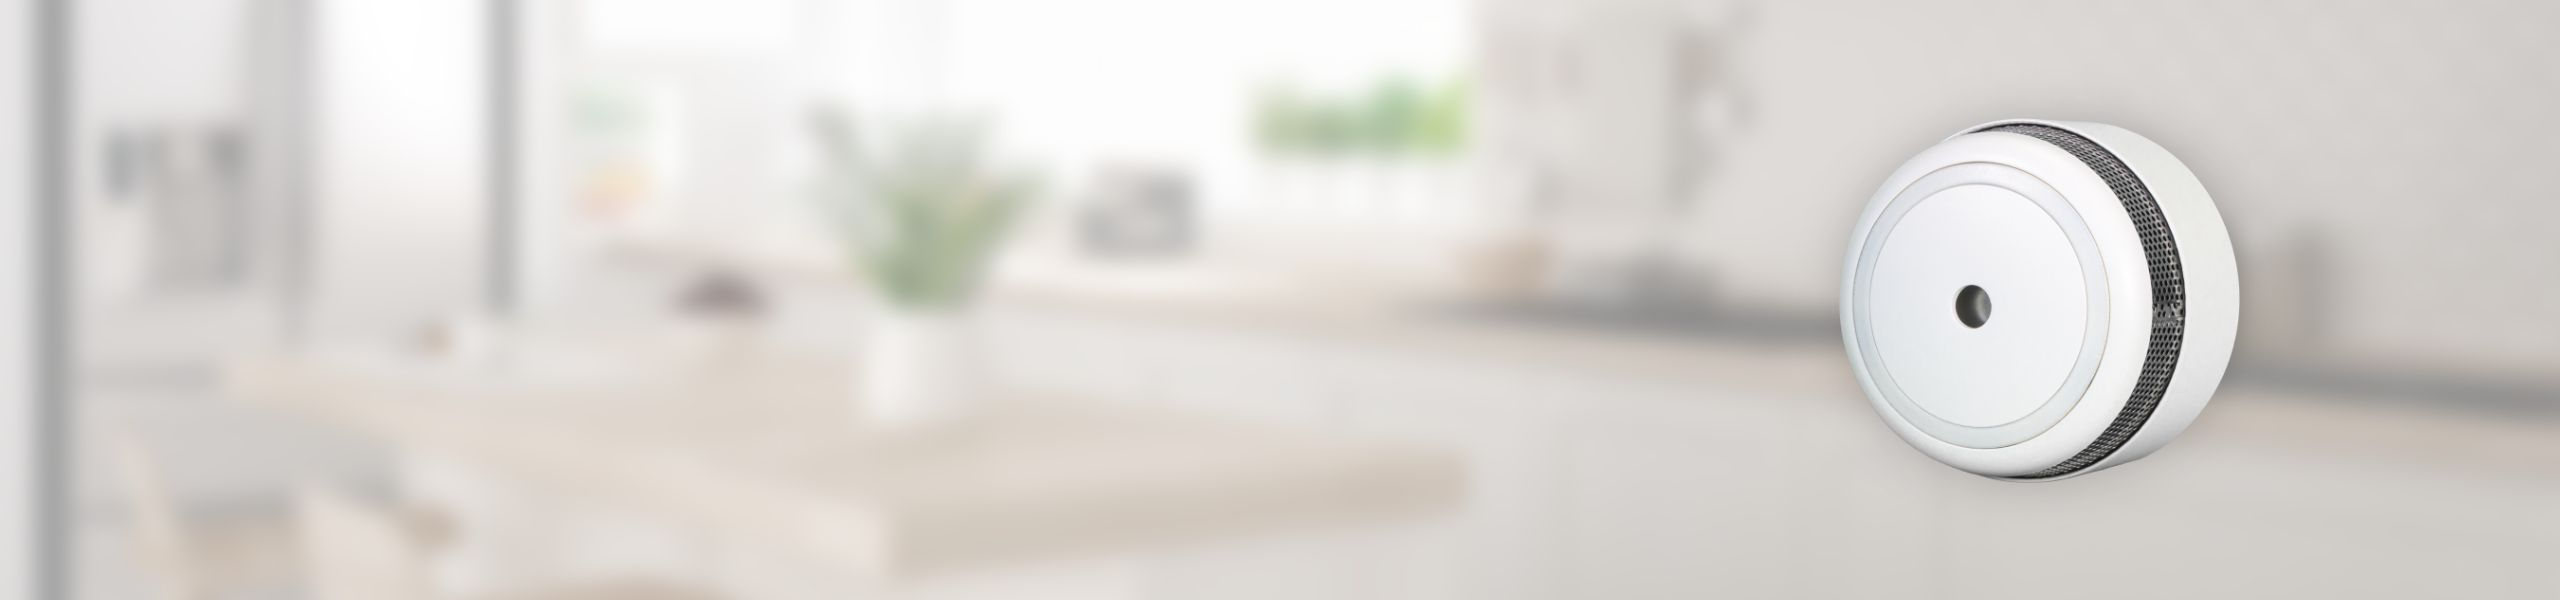 White smoke alarm sensor Nearsens with living room on the background